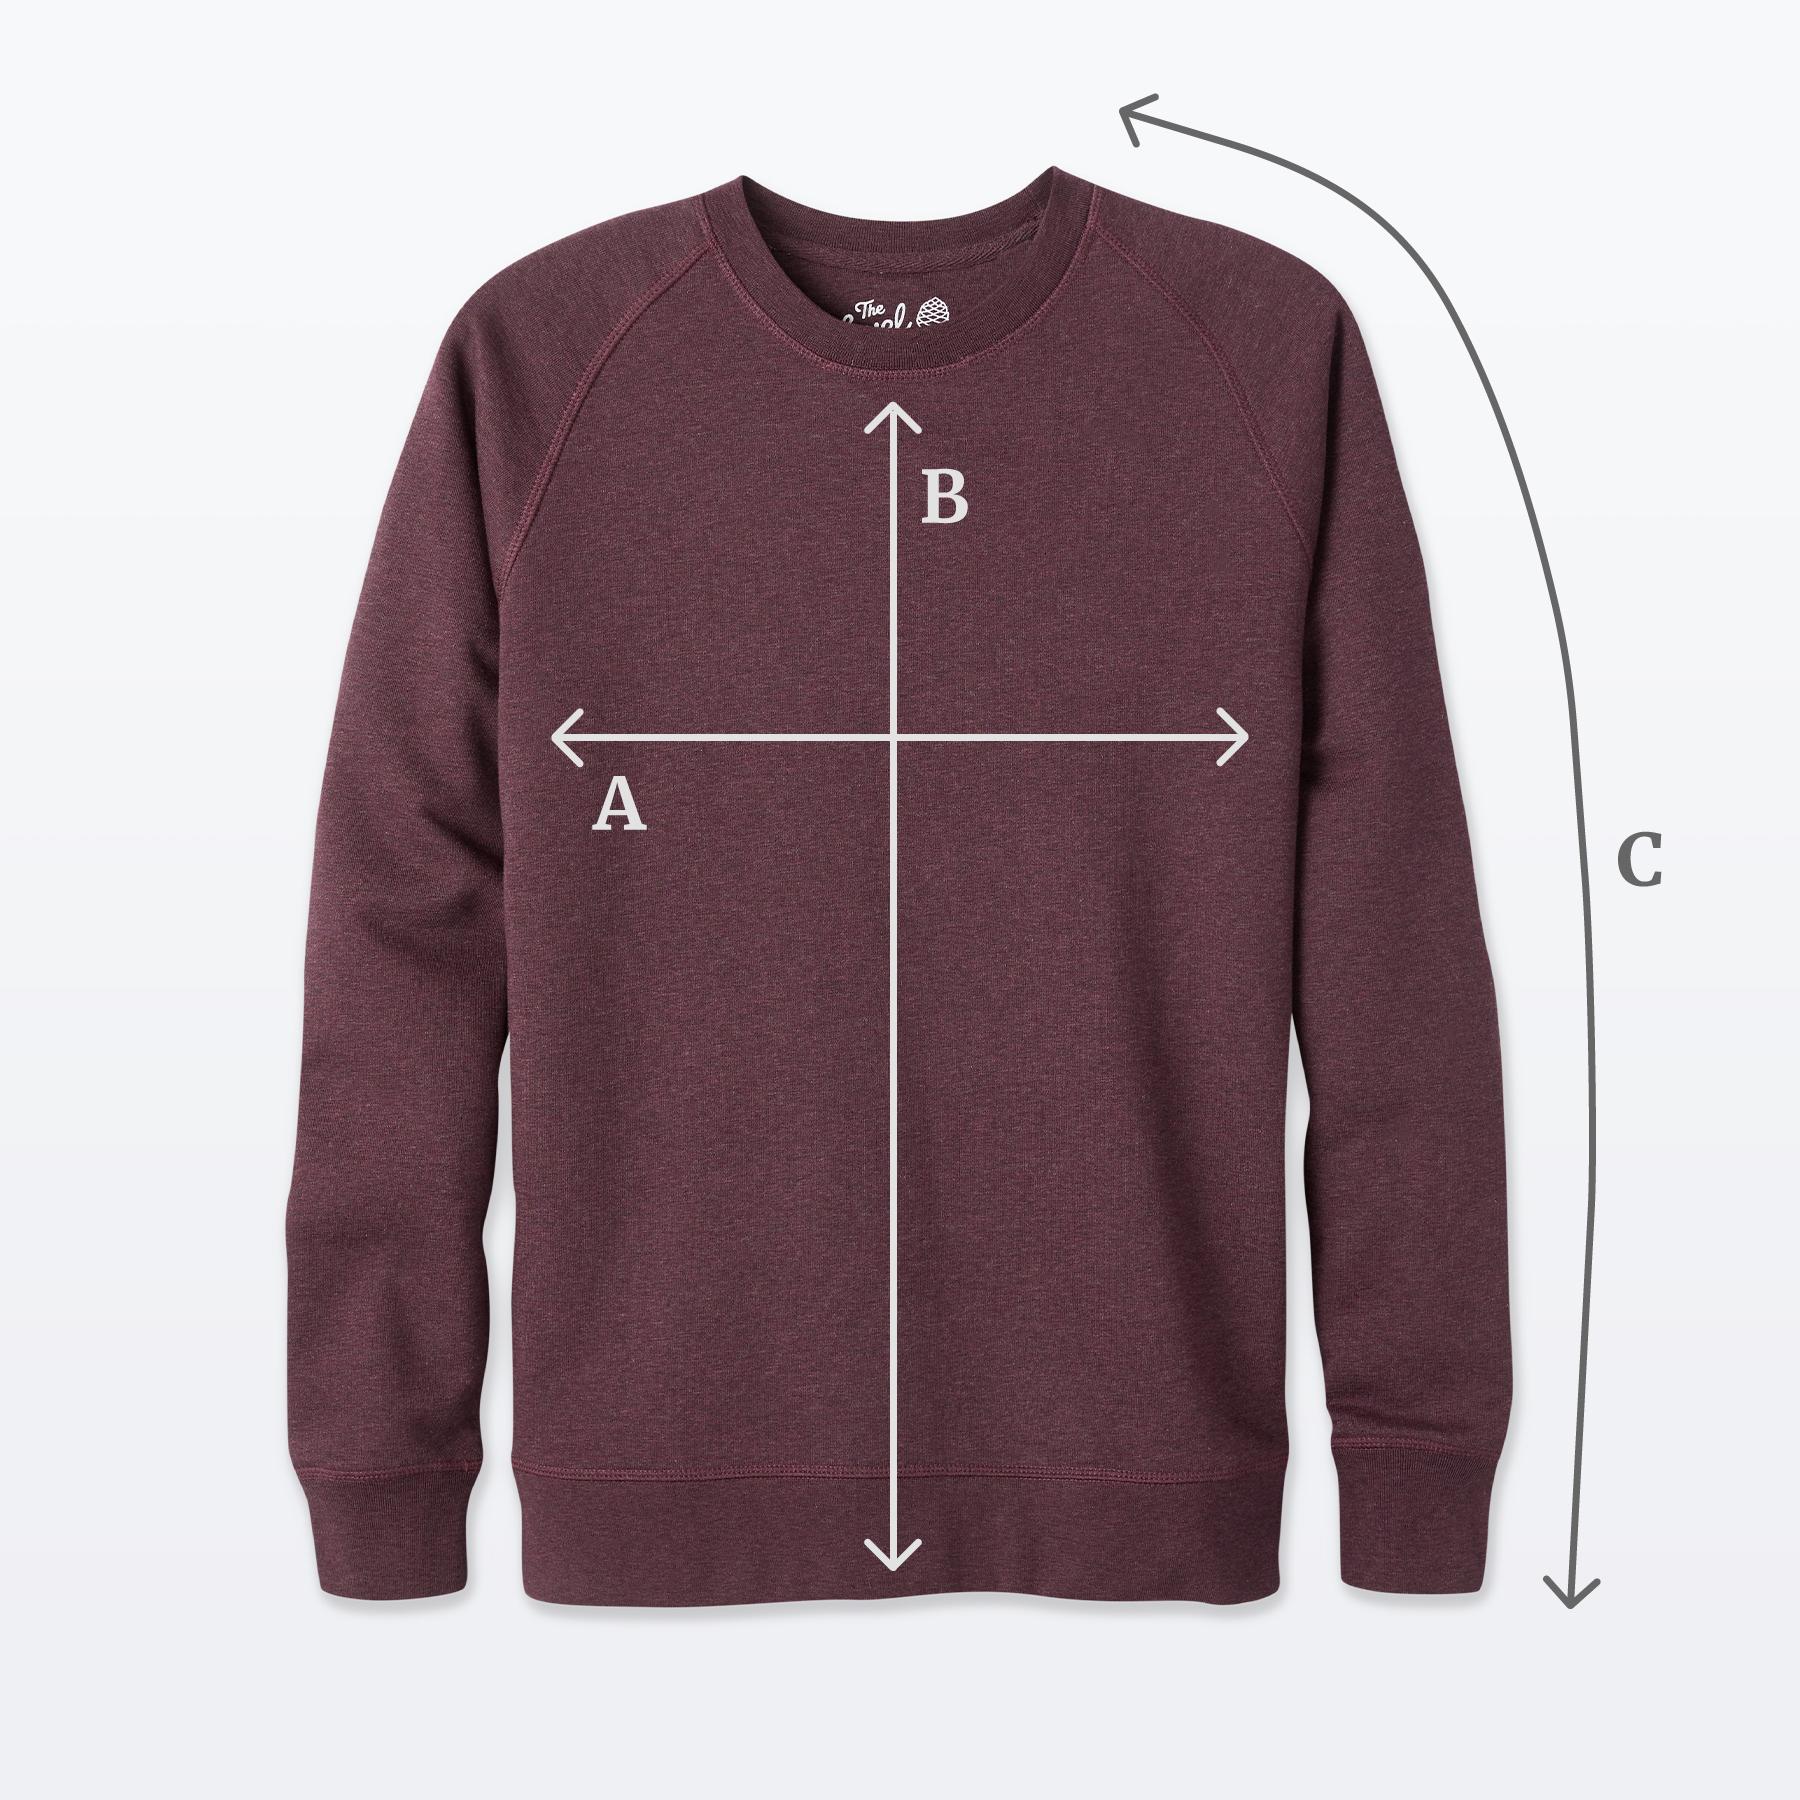 Organic-cotton-blend-sweater-blank.jpg